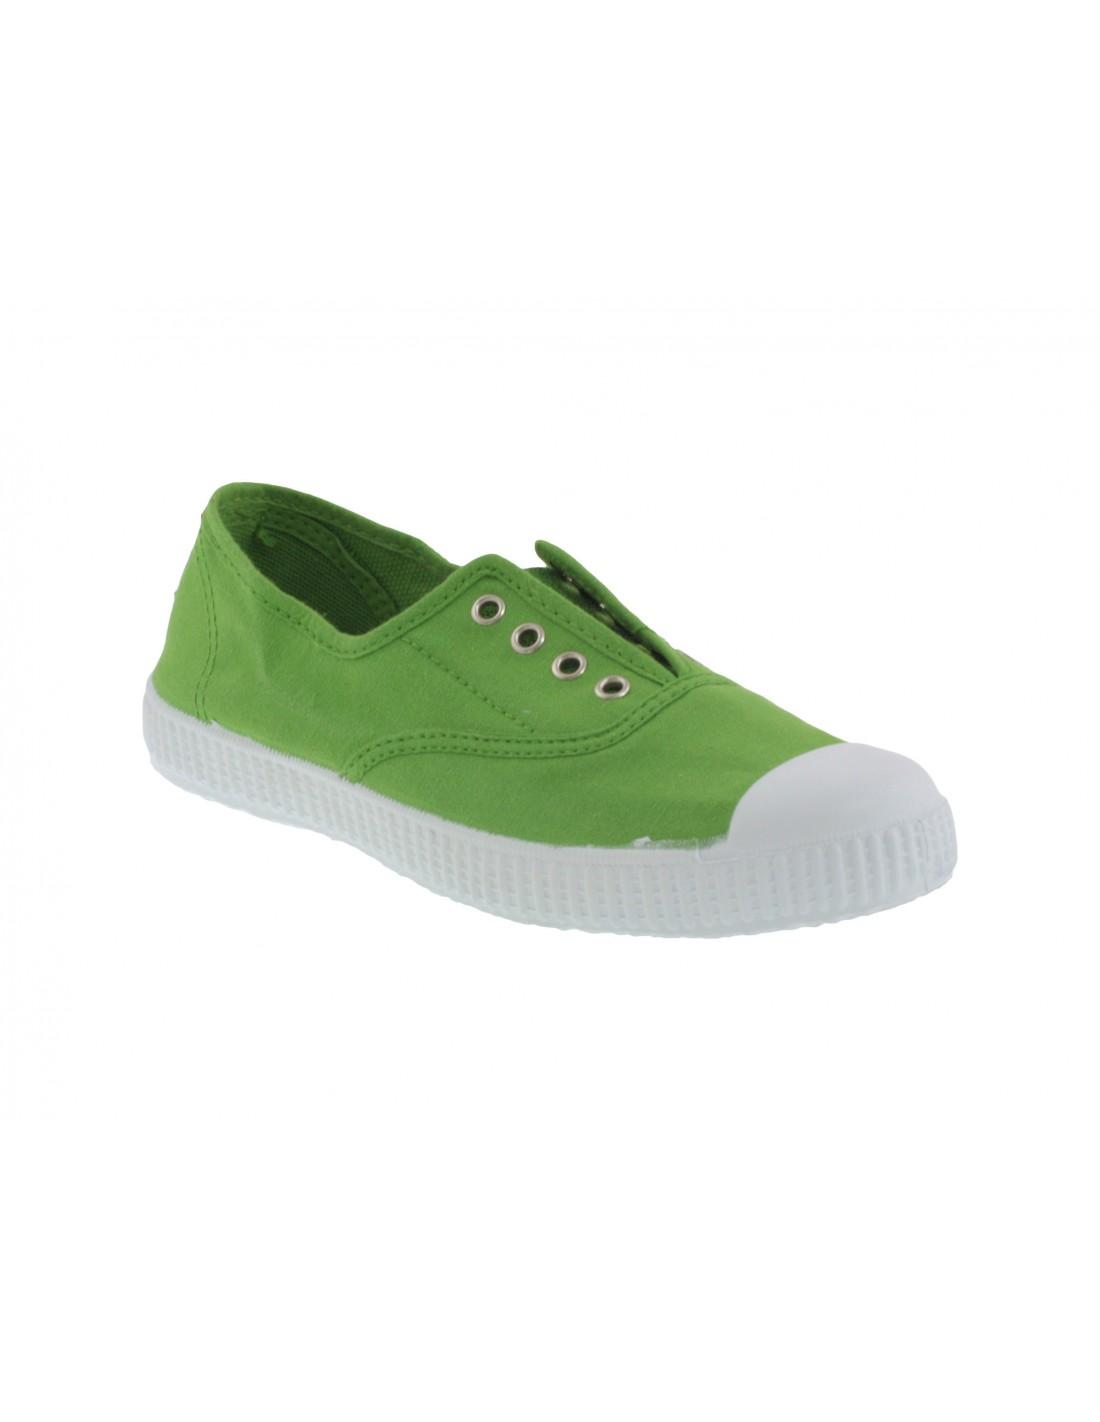 huge discount dfbdd 67729 Scarpe estive bambino Cienta slip on verde